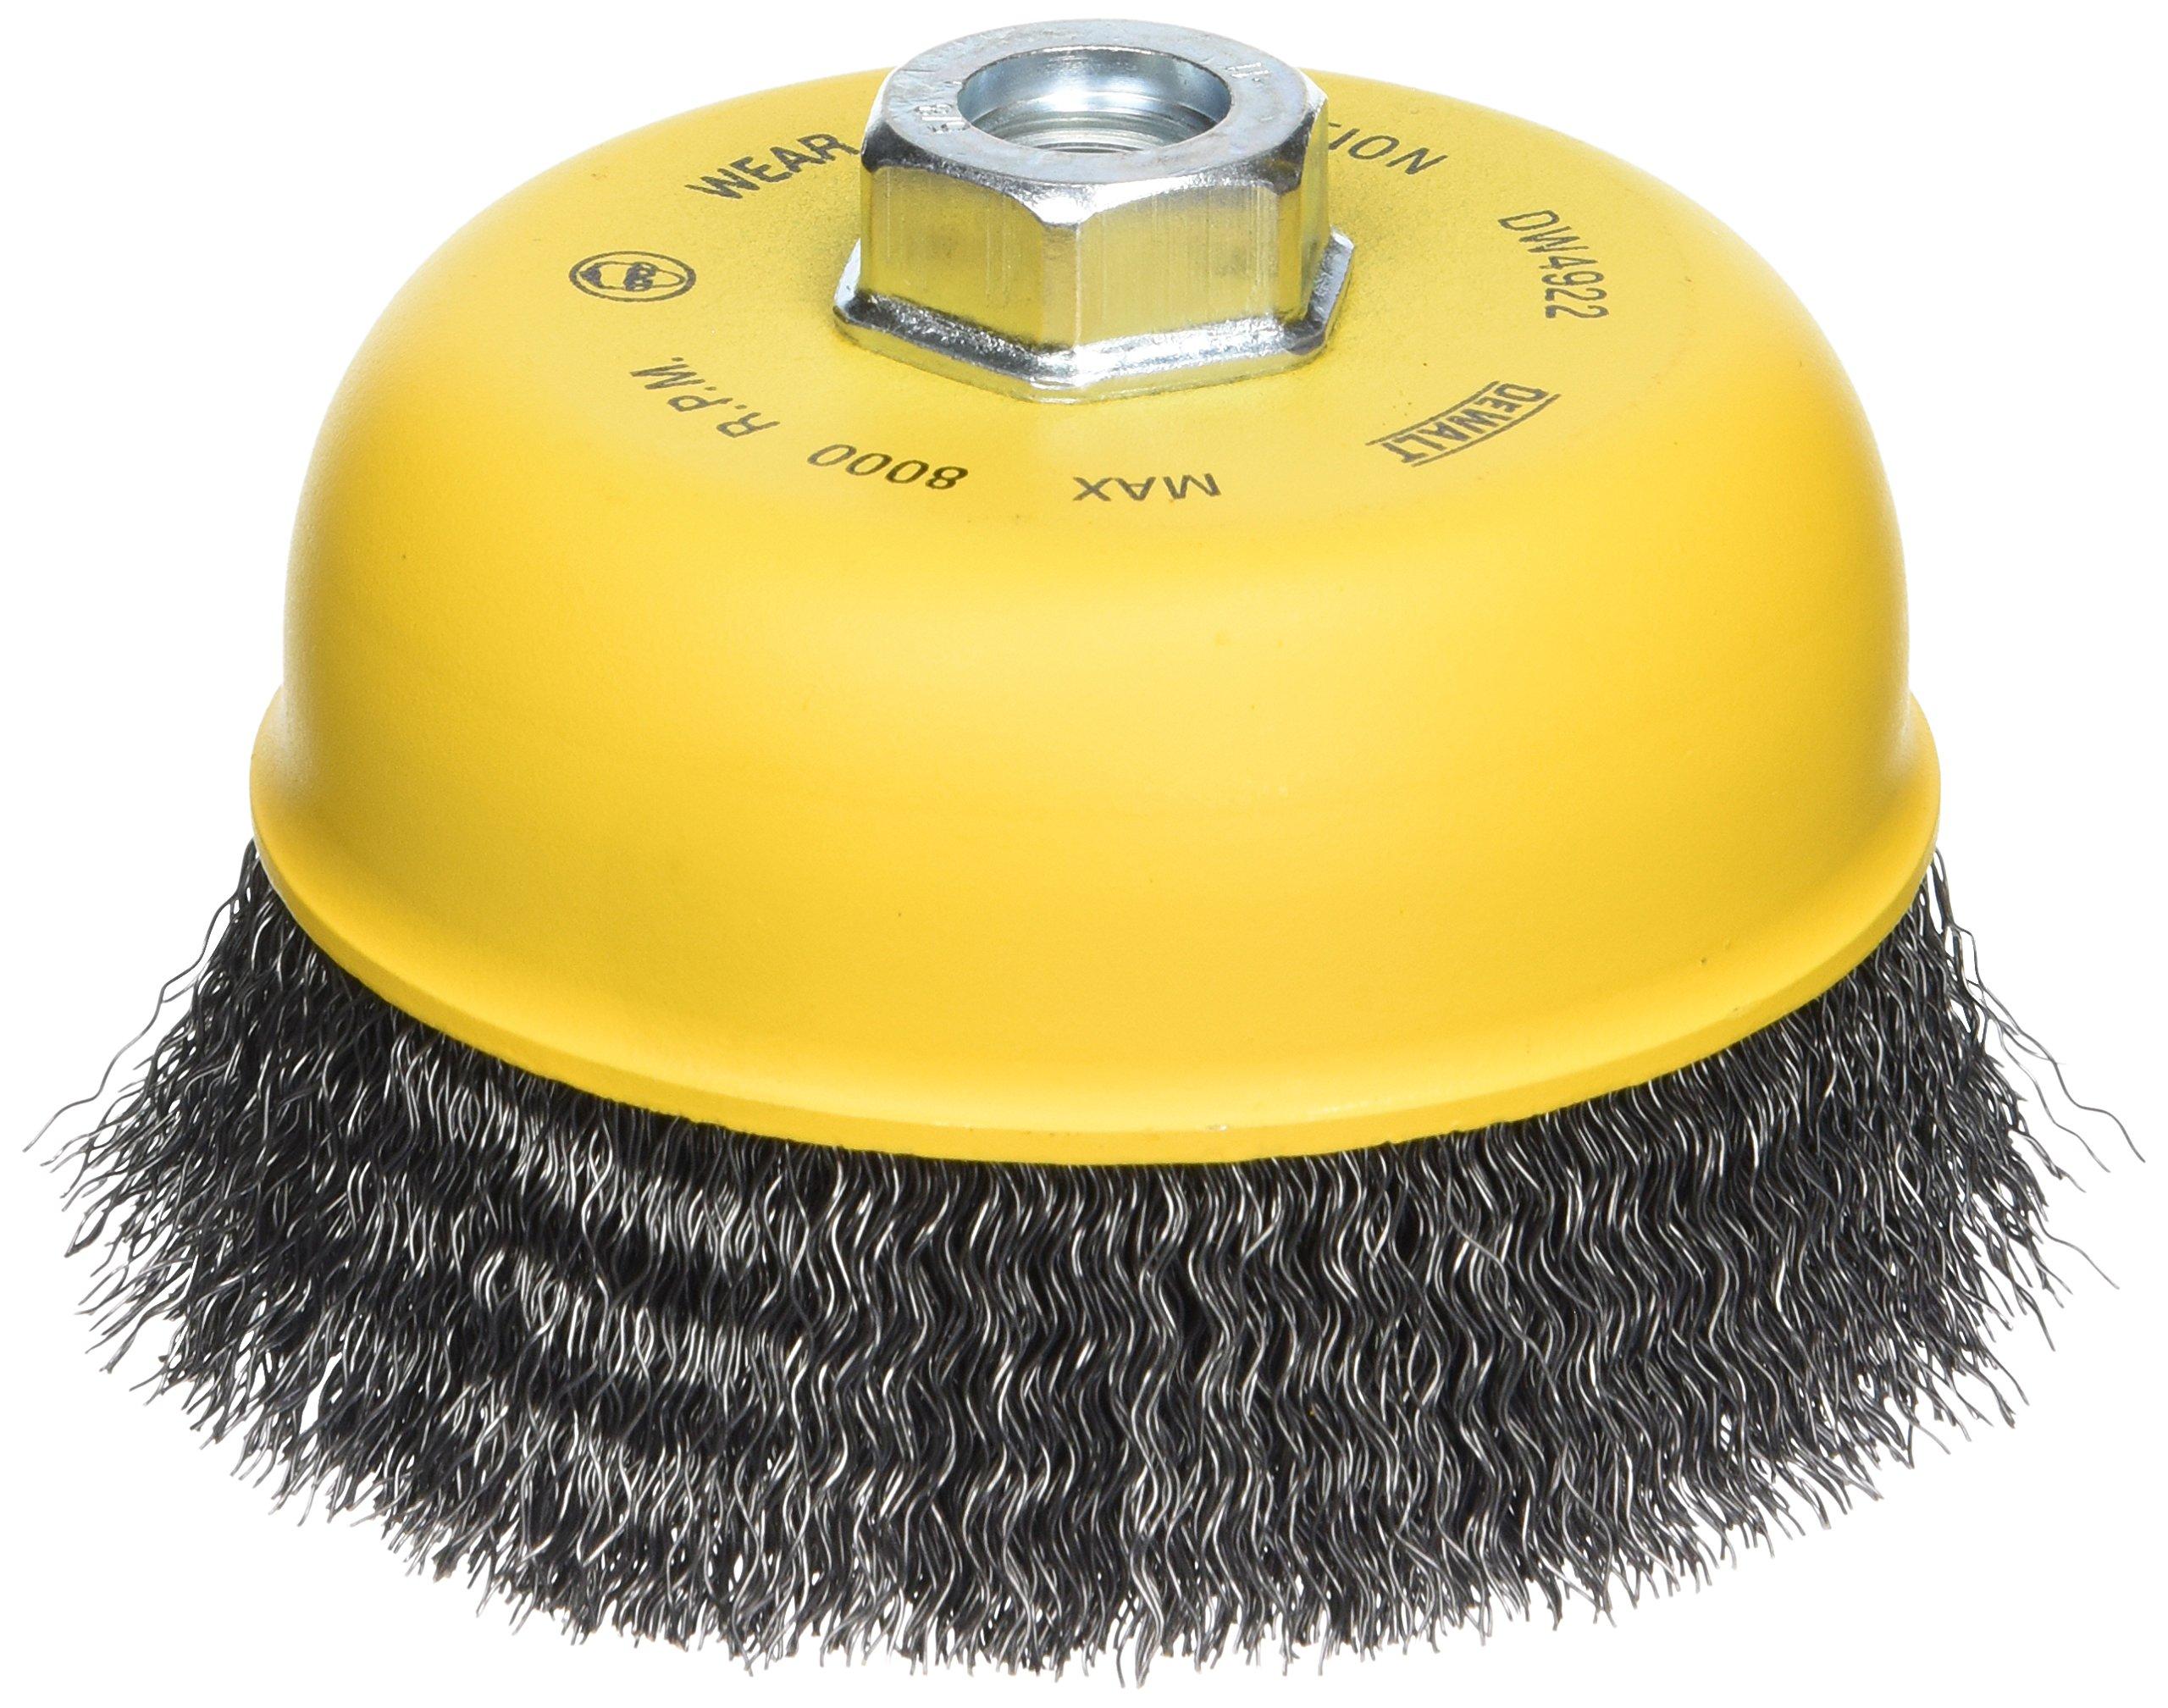 DEWALT DW4922 5-Inch Crimped Cup Brush/Carbon Steel 5/8-Inch-11 Arbor .020-Inch